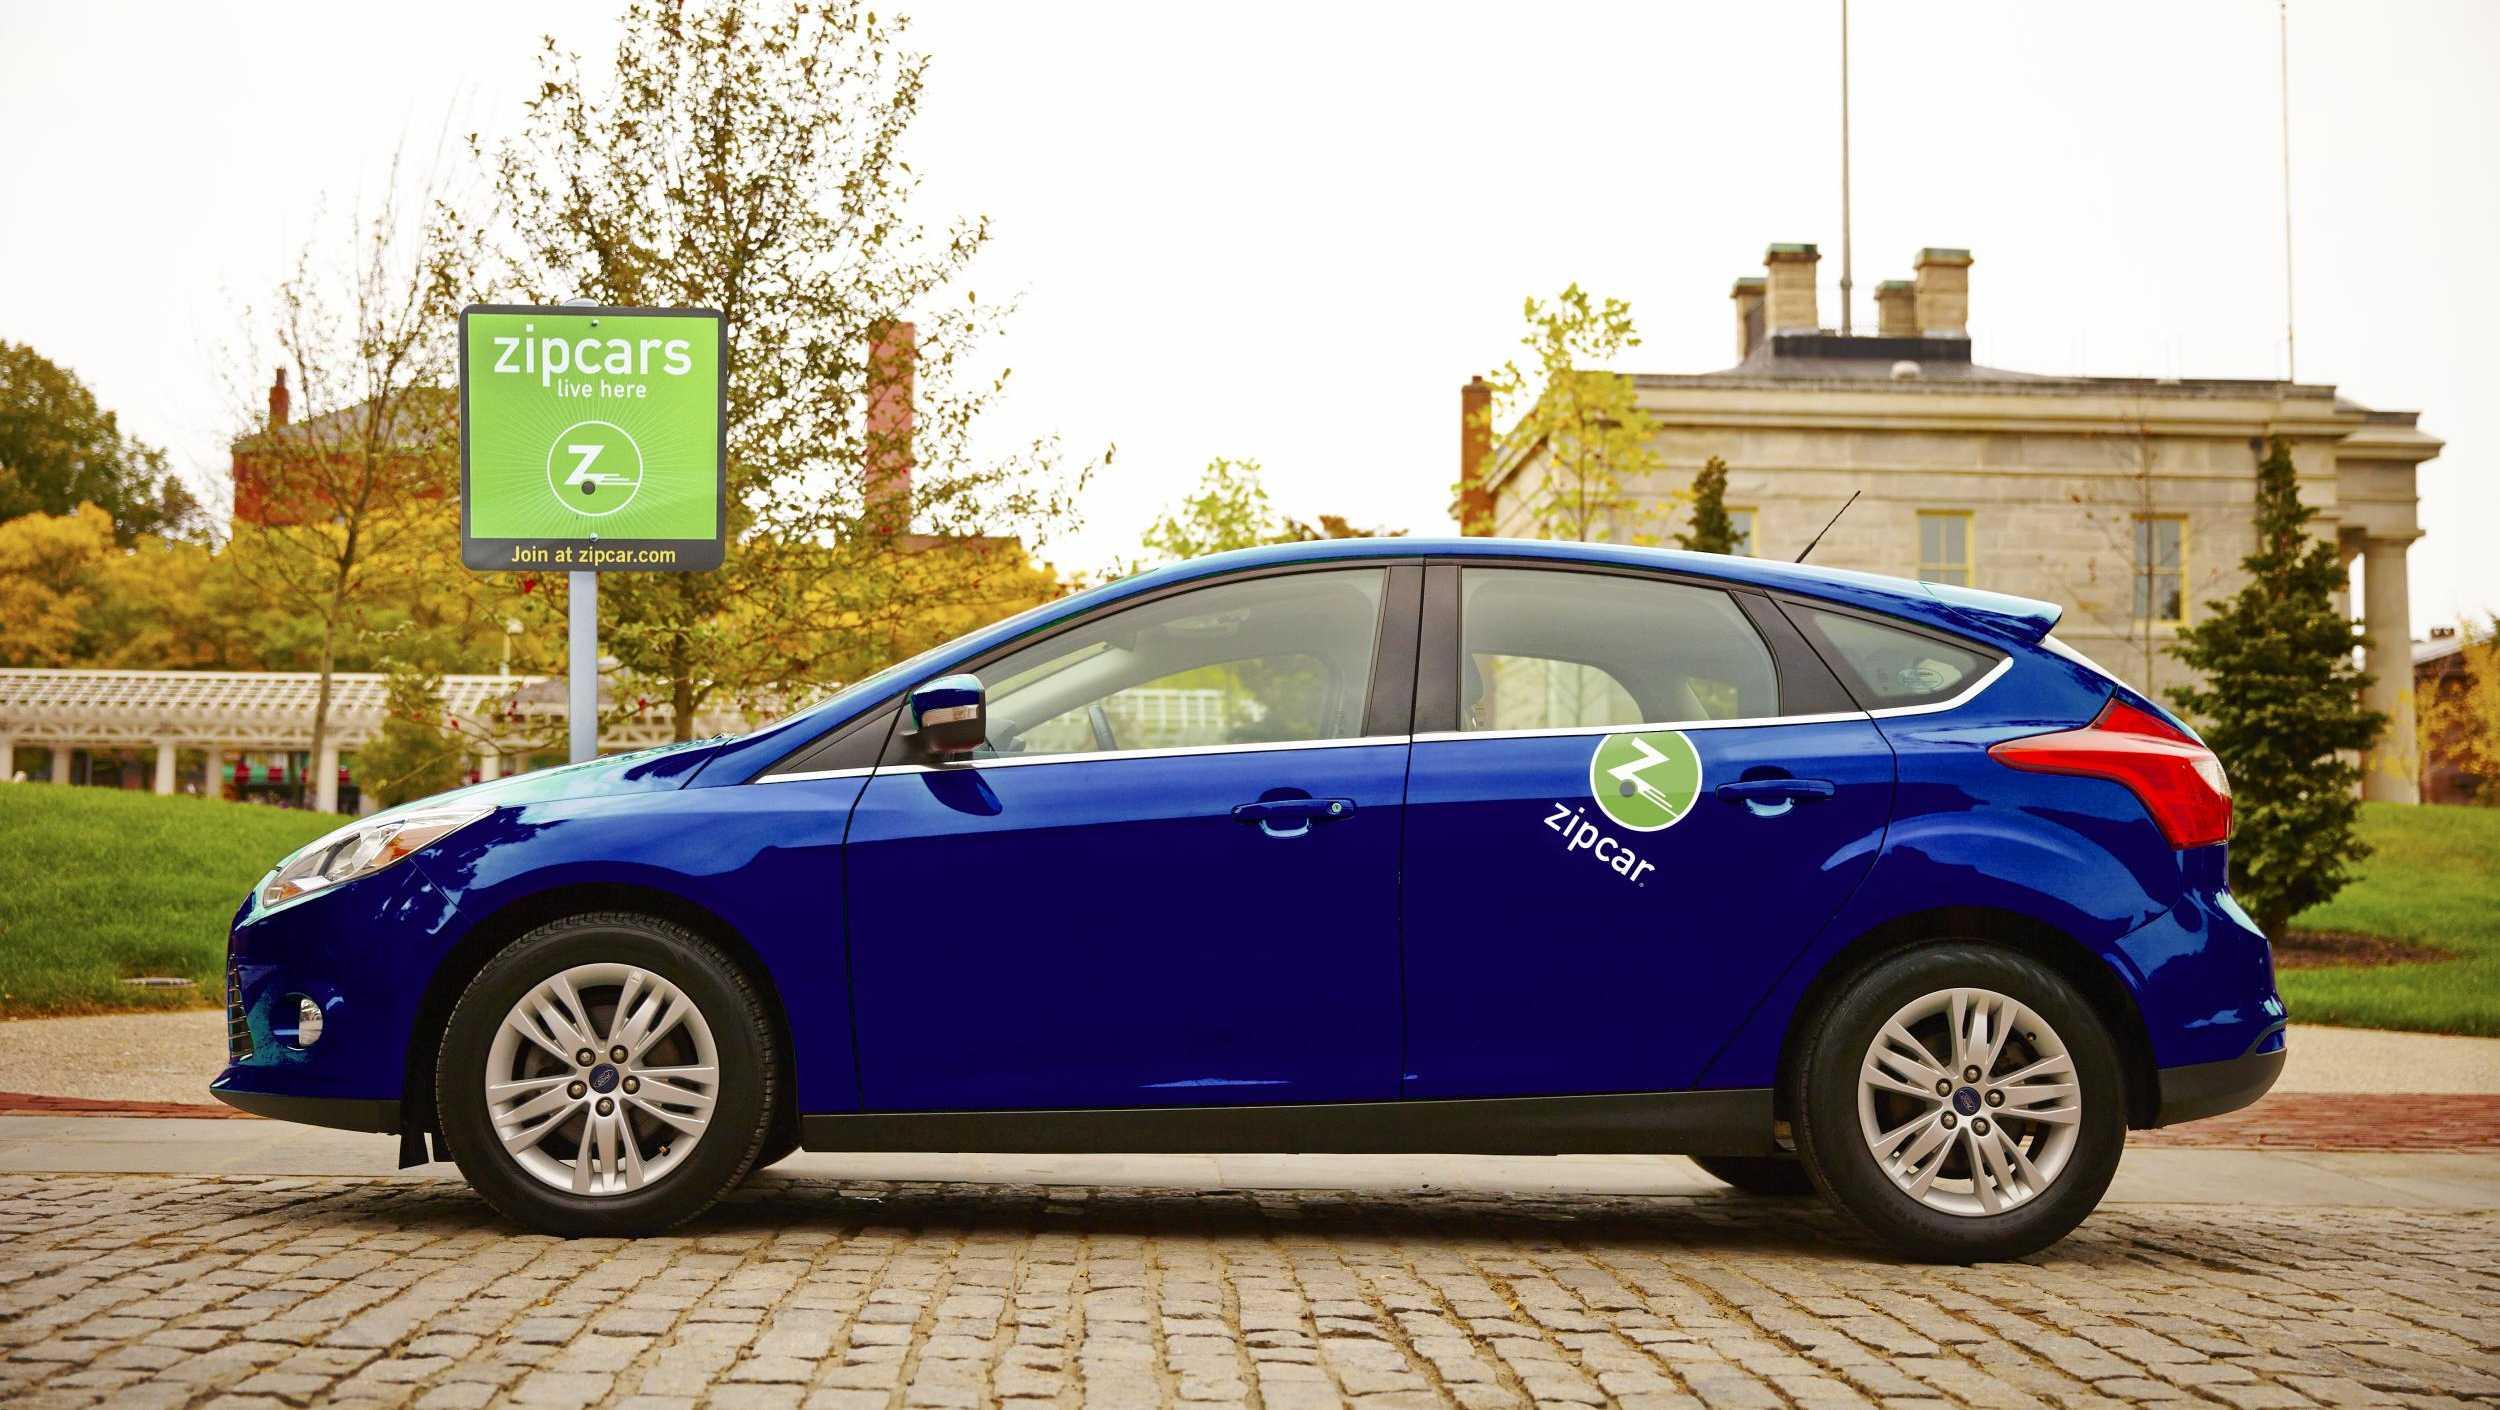 Zipcar stock image